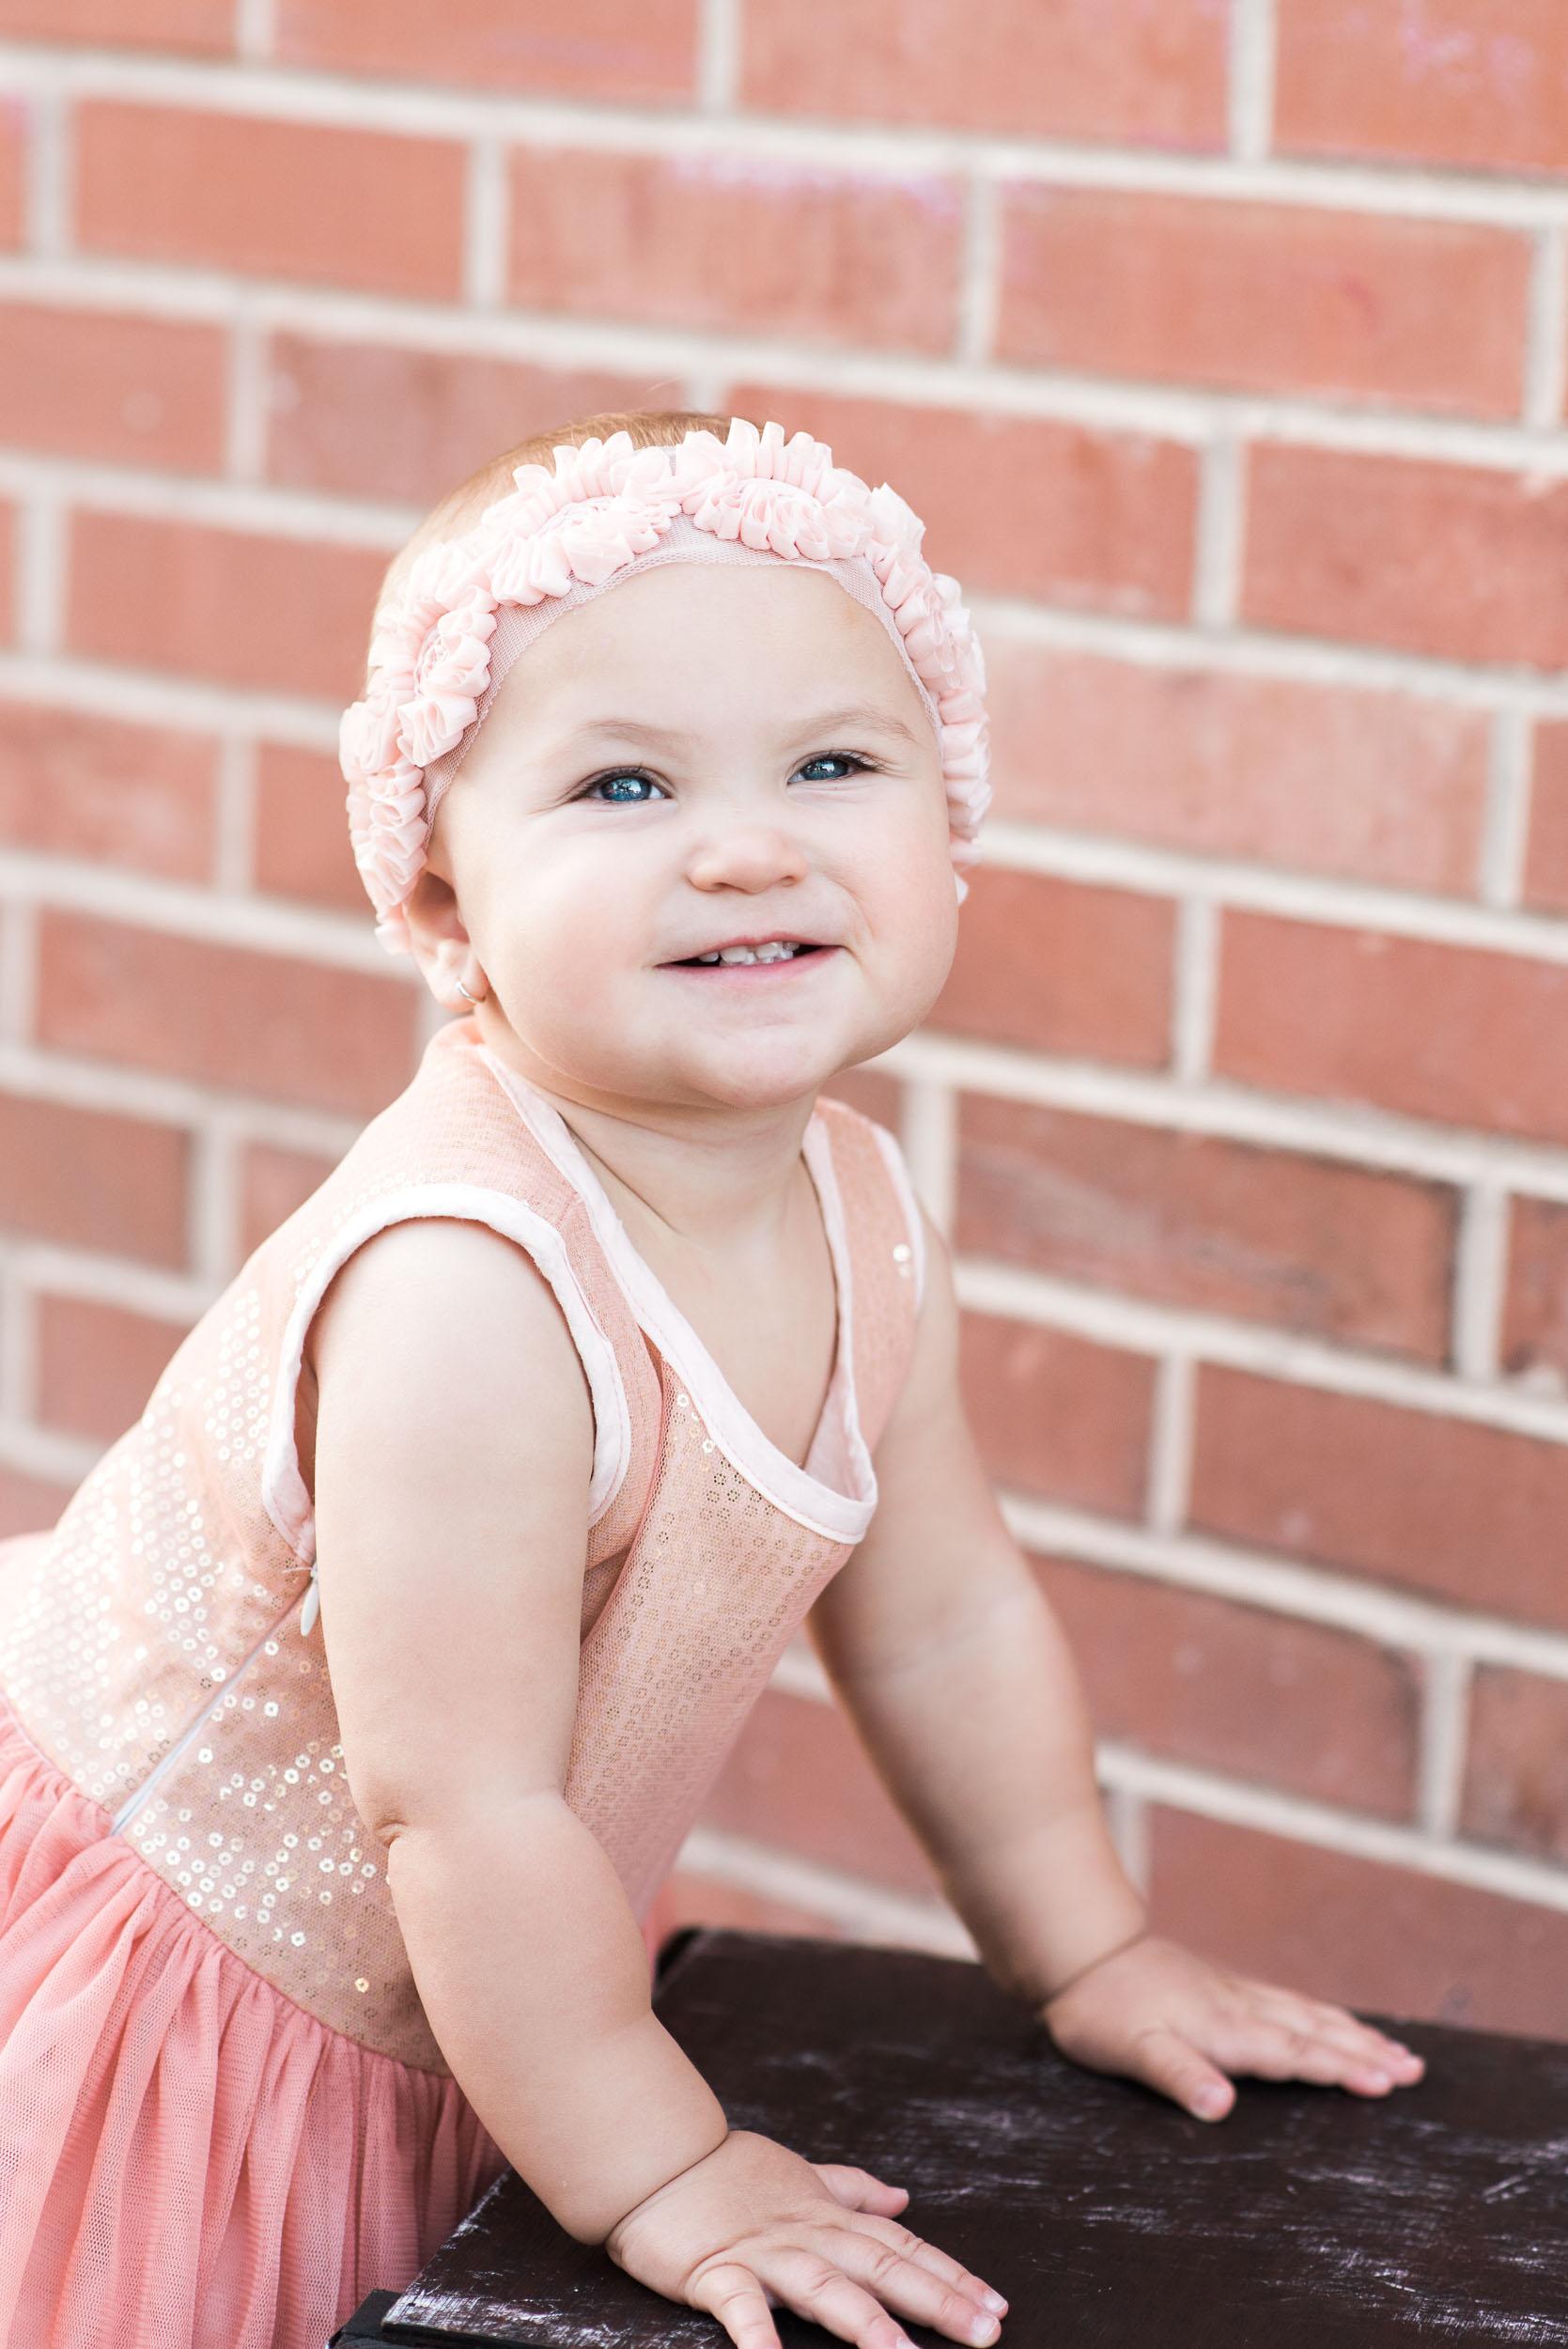 RachaelLaynePhotography01-3.jpg